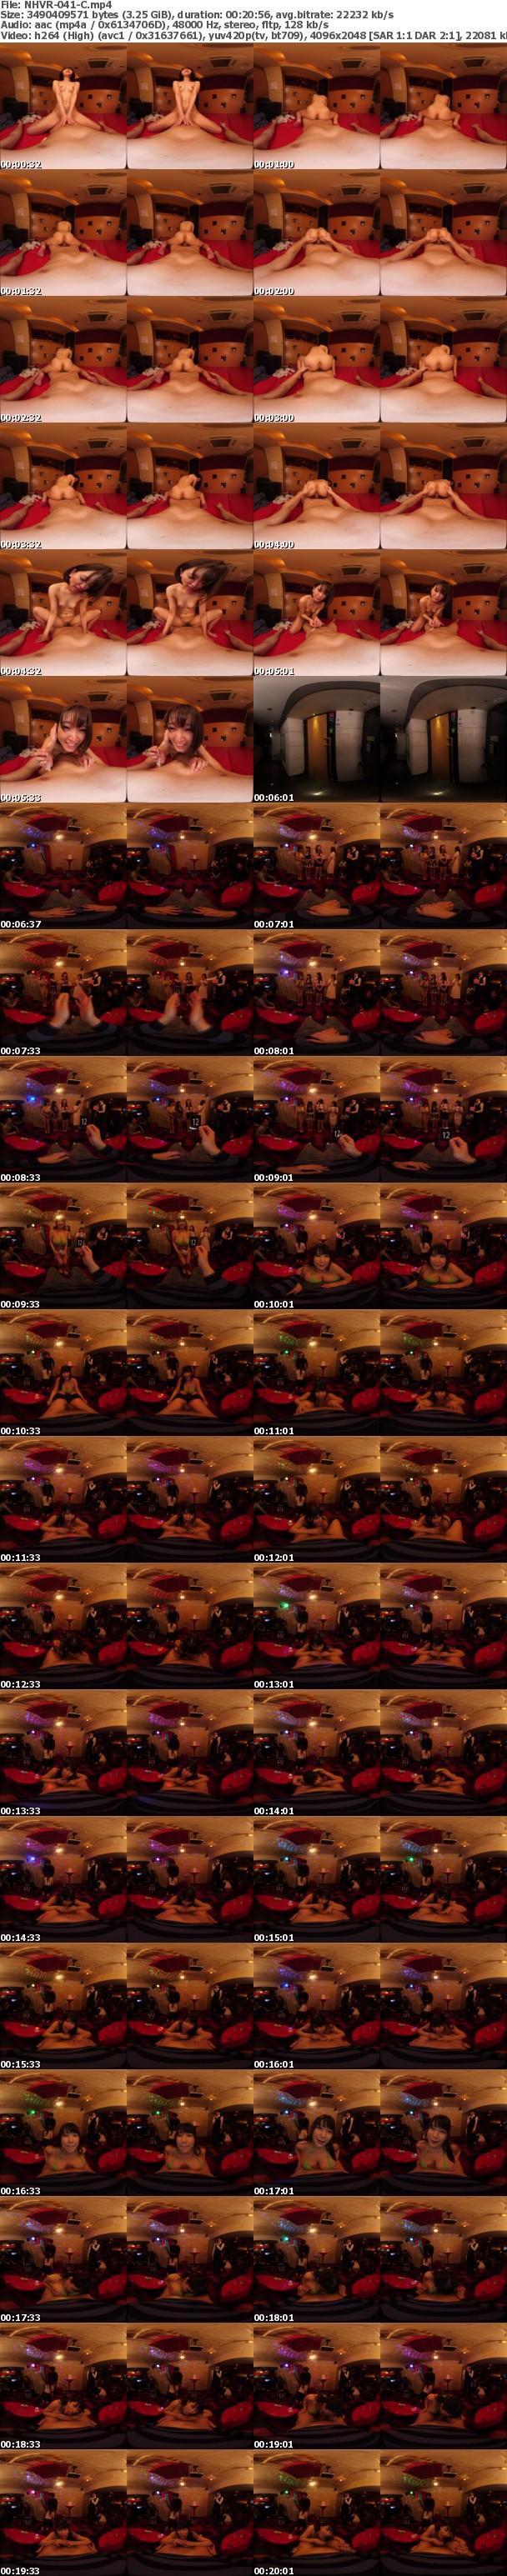 (VR) NHVR-041 歌舞伎町A店全面協力!本物店舗で撮影した超リアルハプニングバー体験 VR